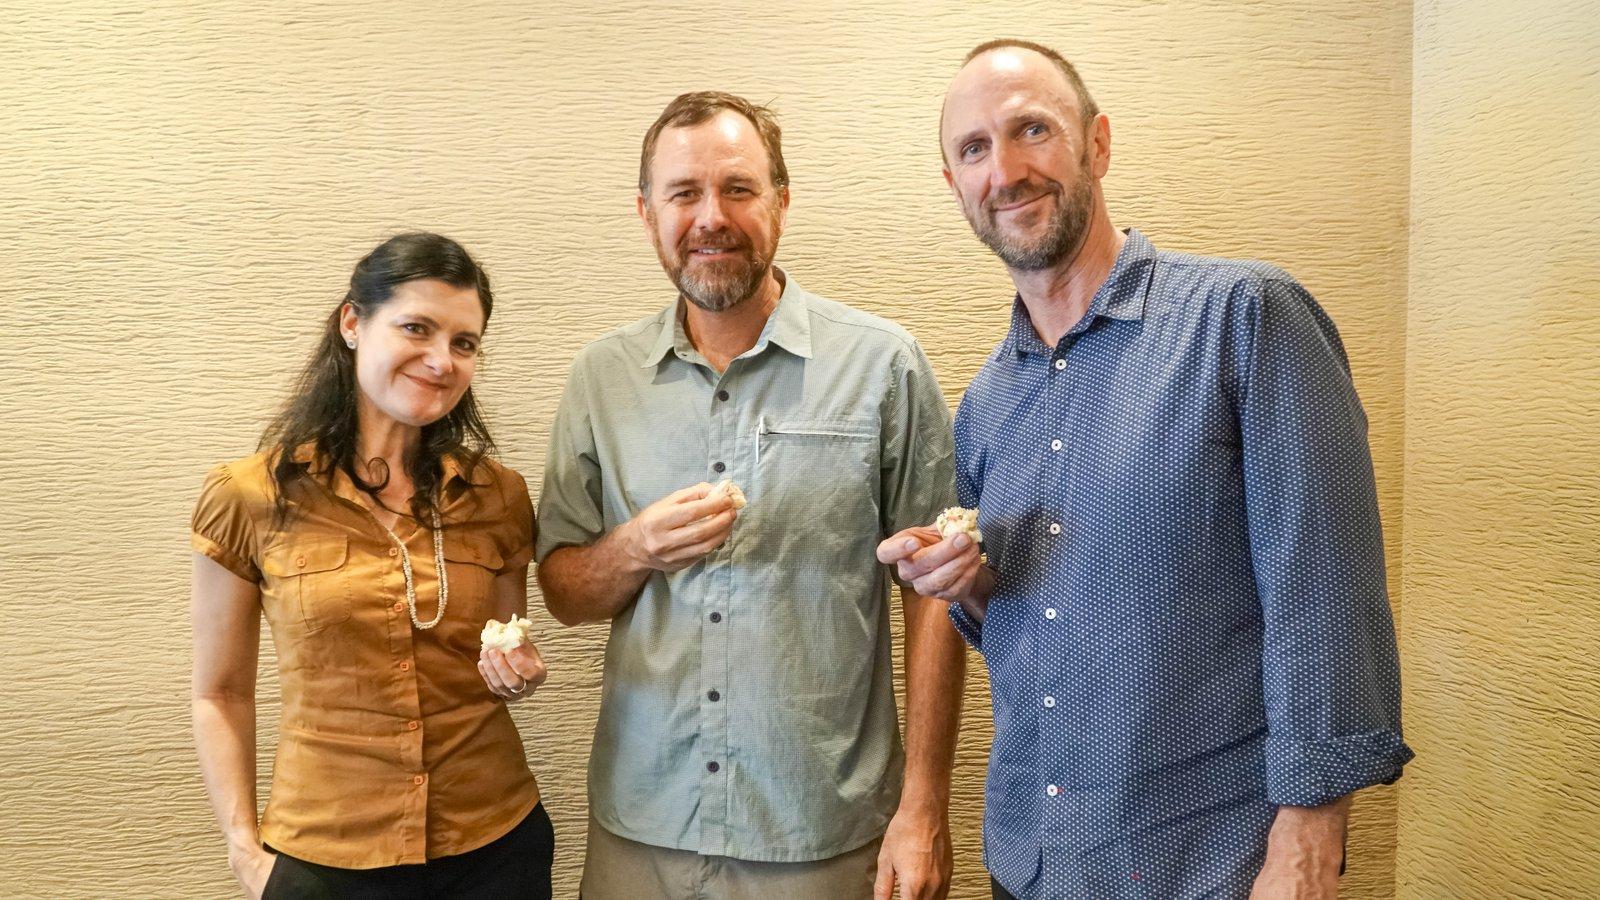 Rebecca Johnson, David McLaren and Paul Flemons enjoy a break during the Honiara workshop, September 2019.